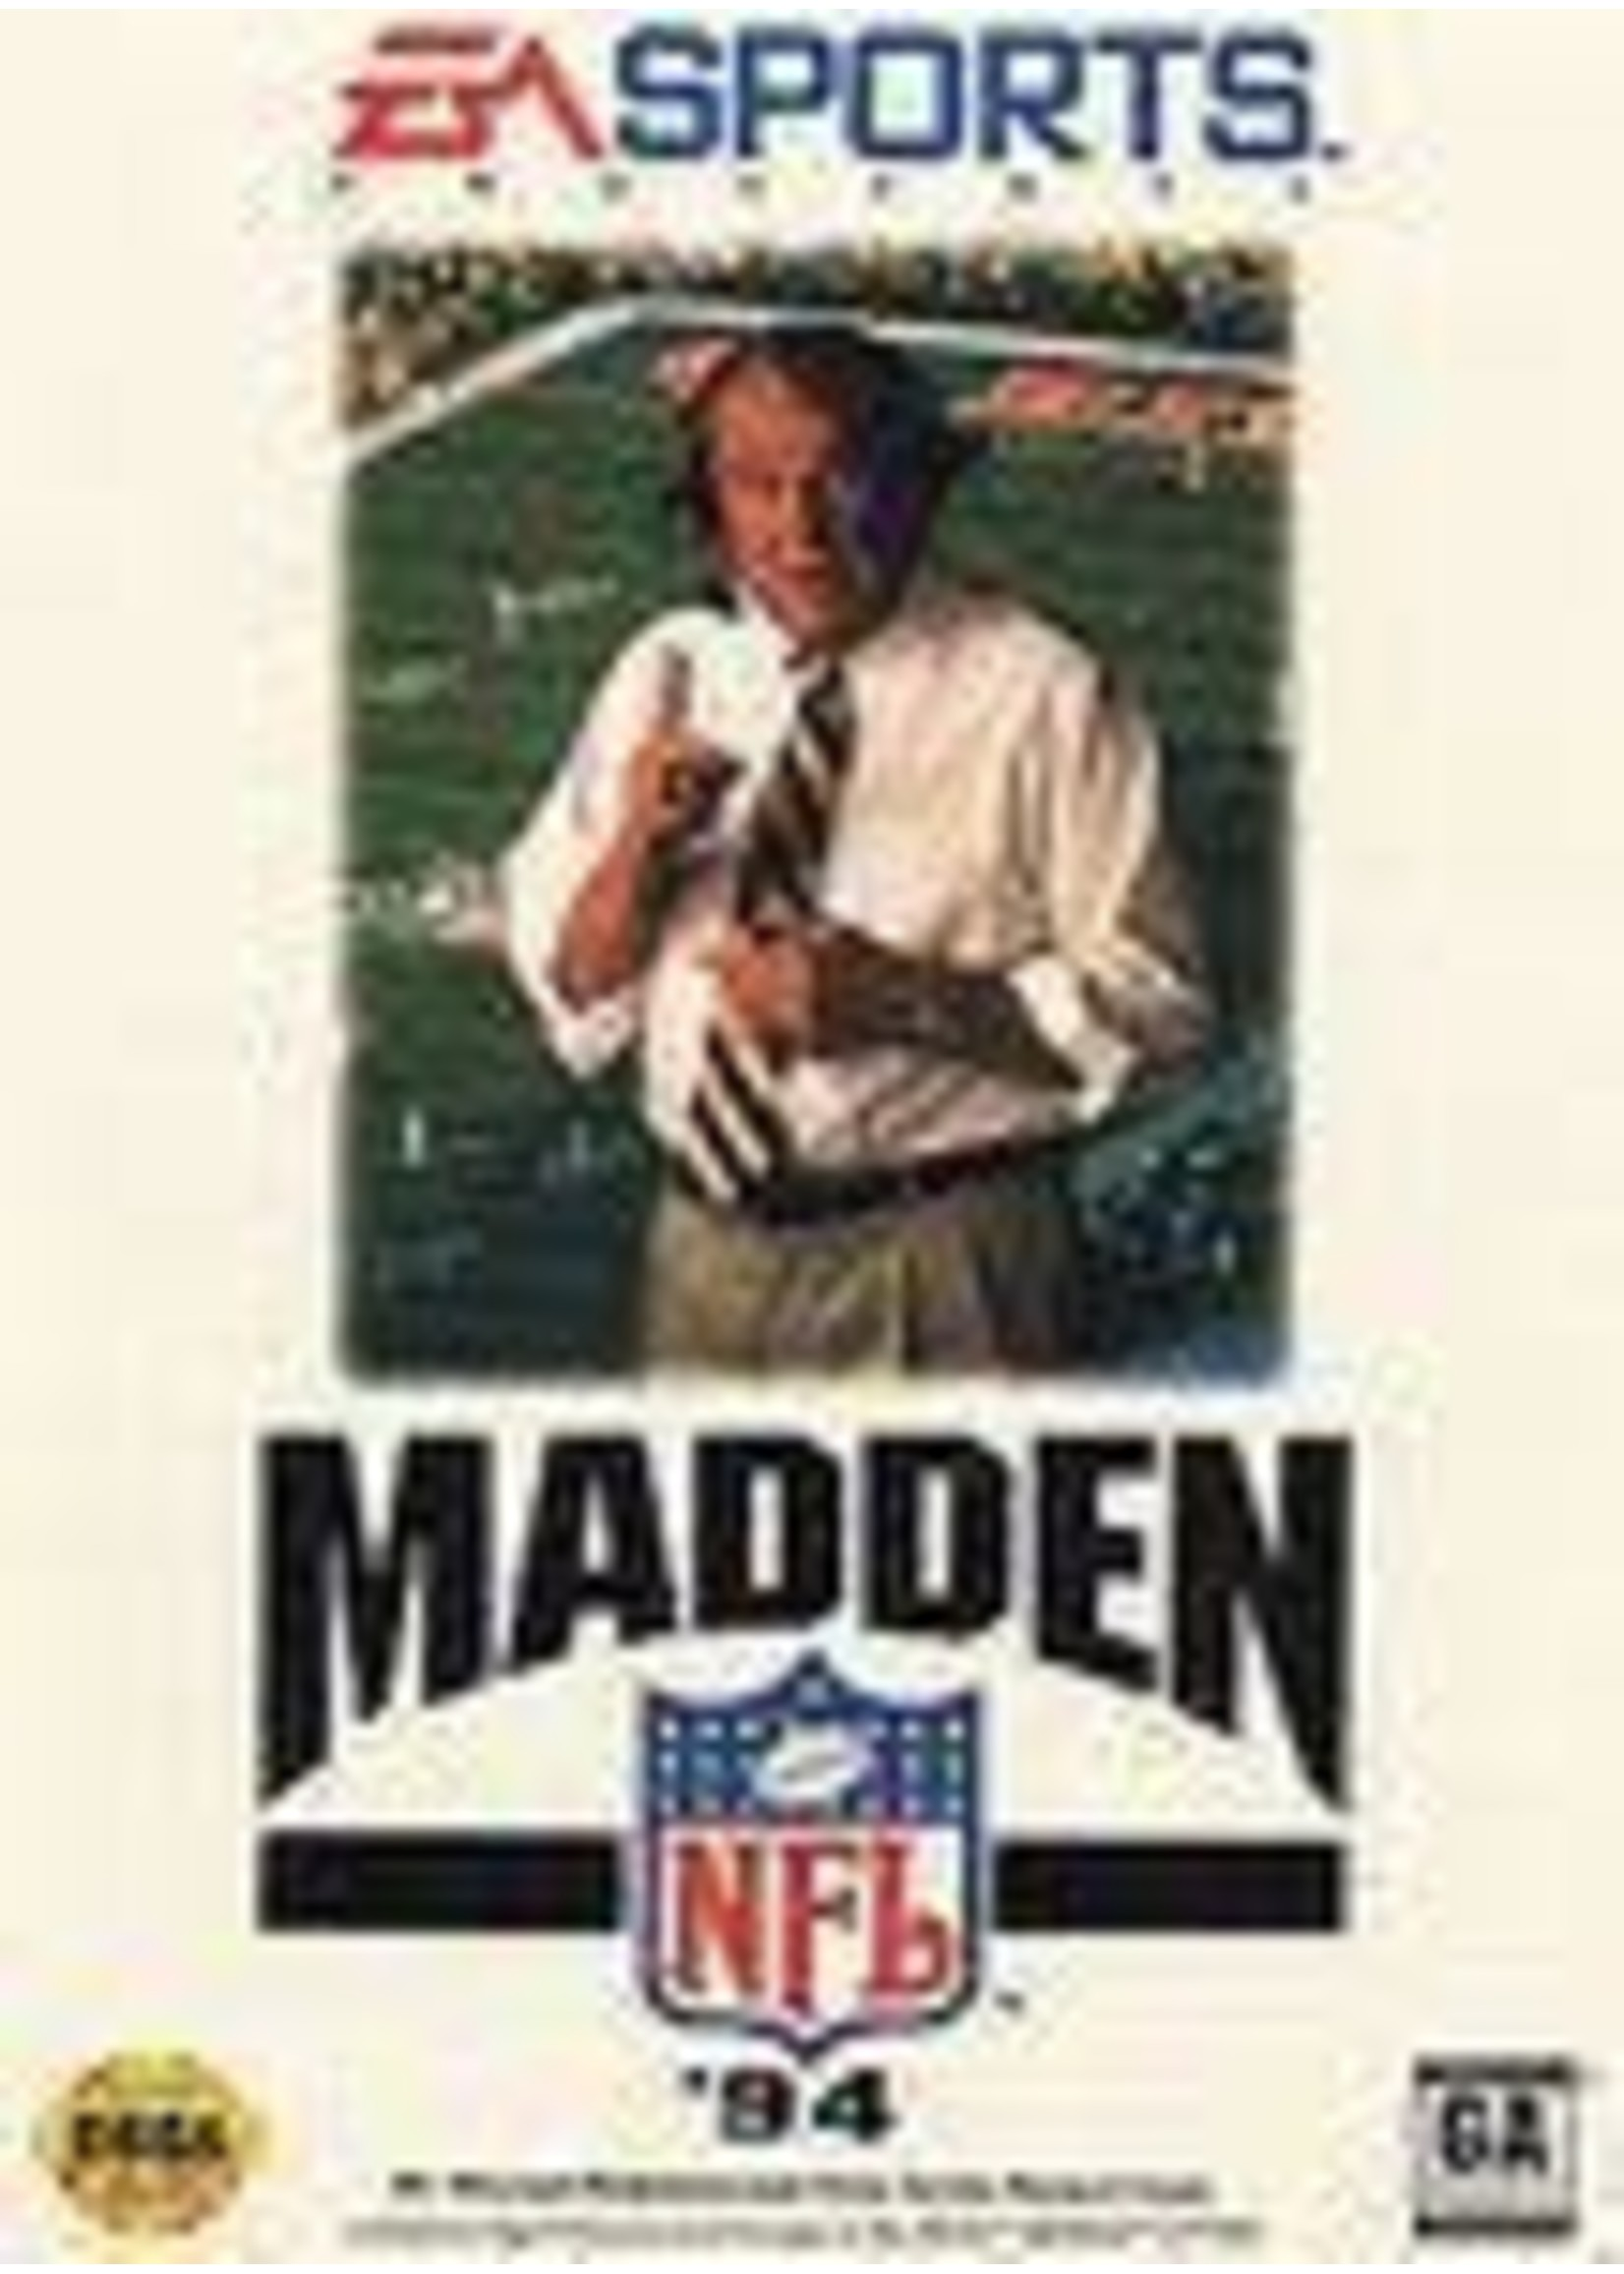 Madden NFL '94 Sega Genesis